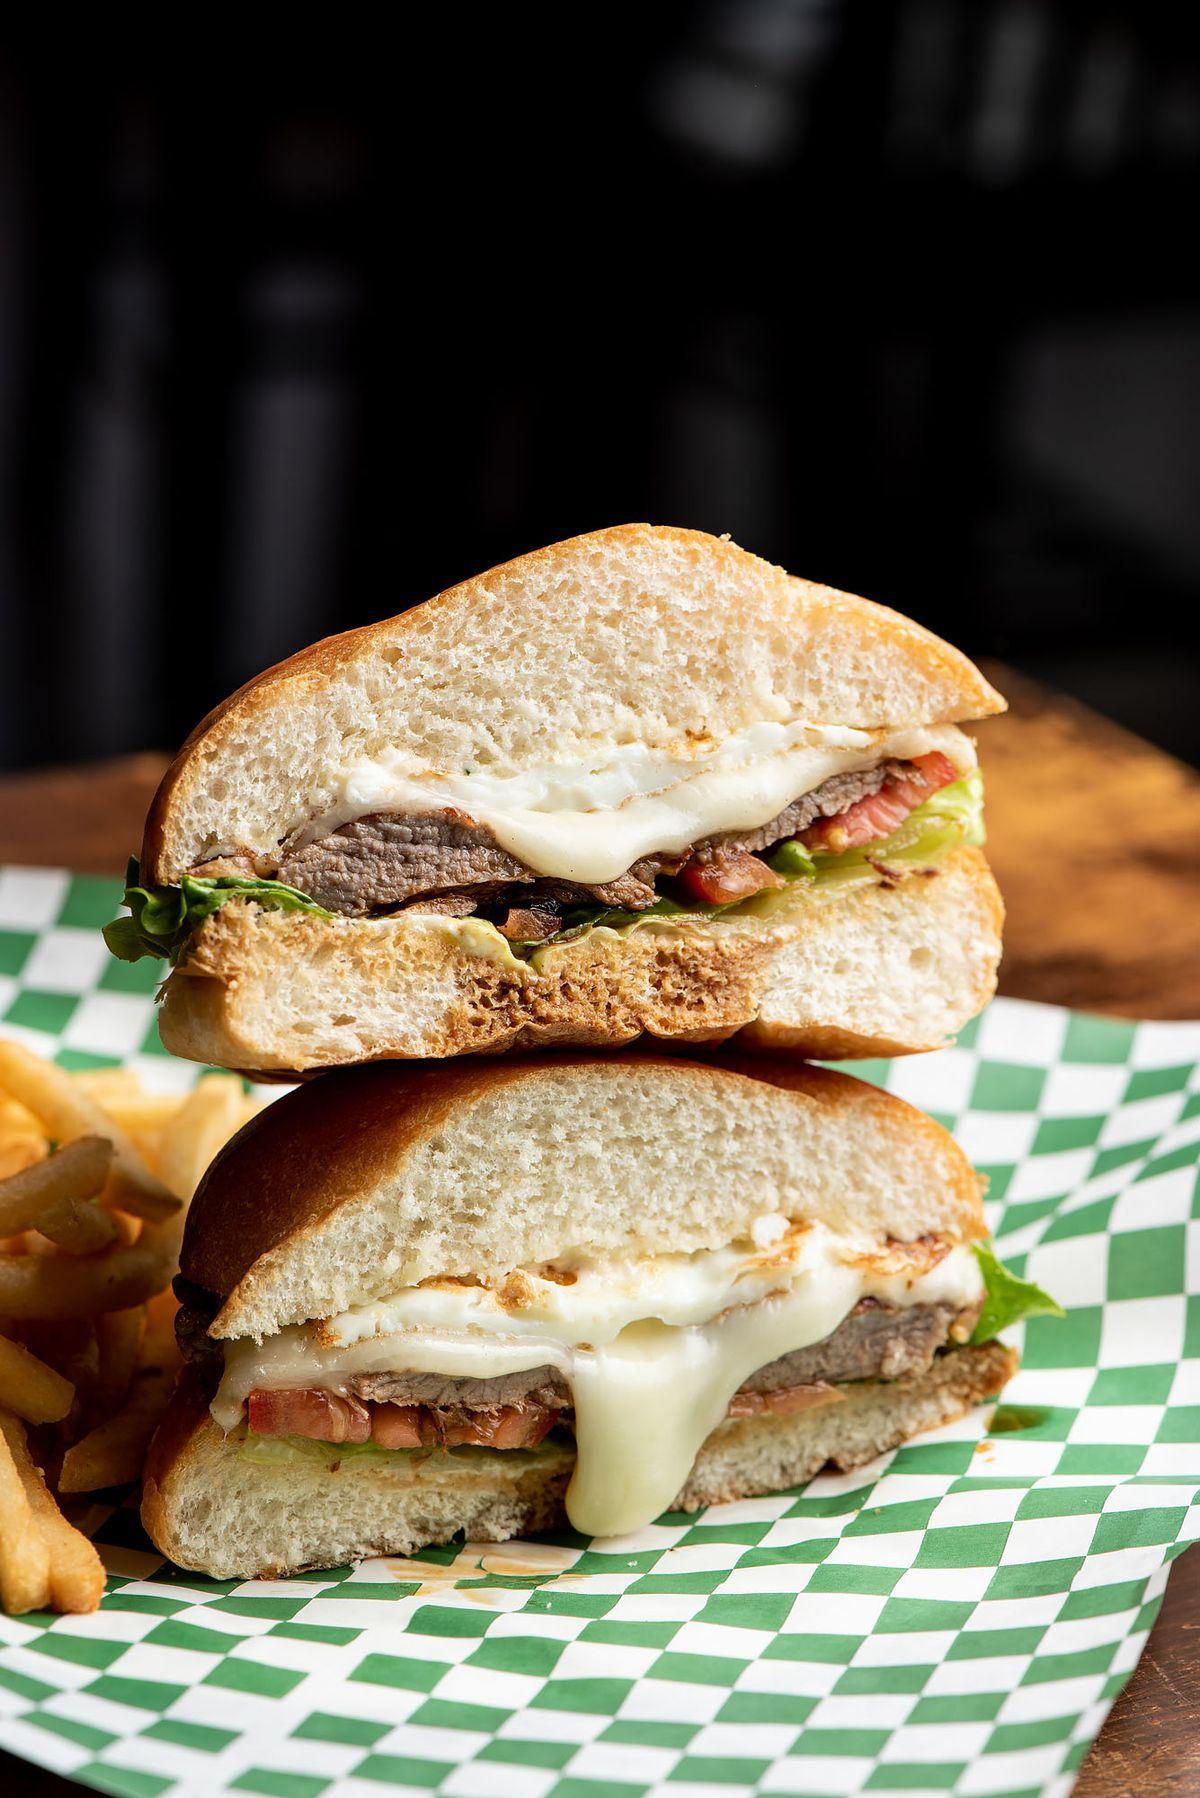 Bauru sandwich with thin beef from Panela's